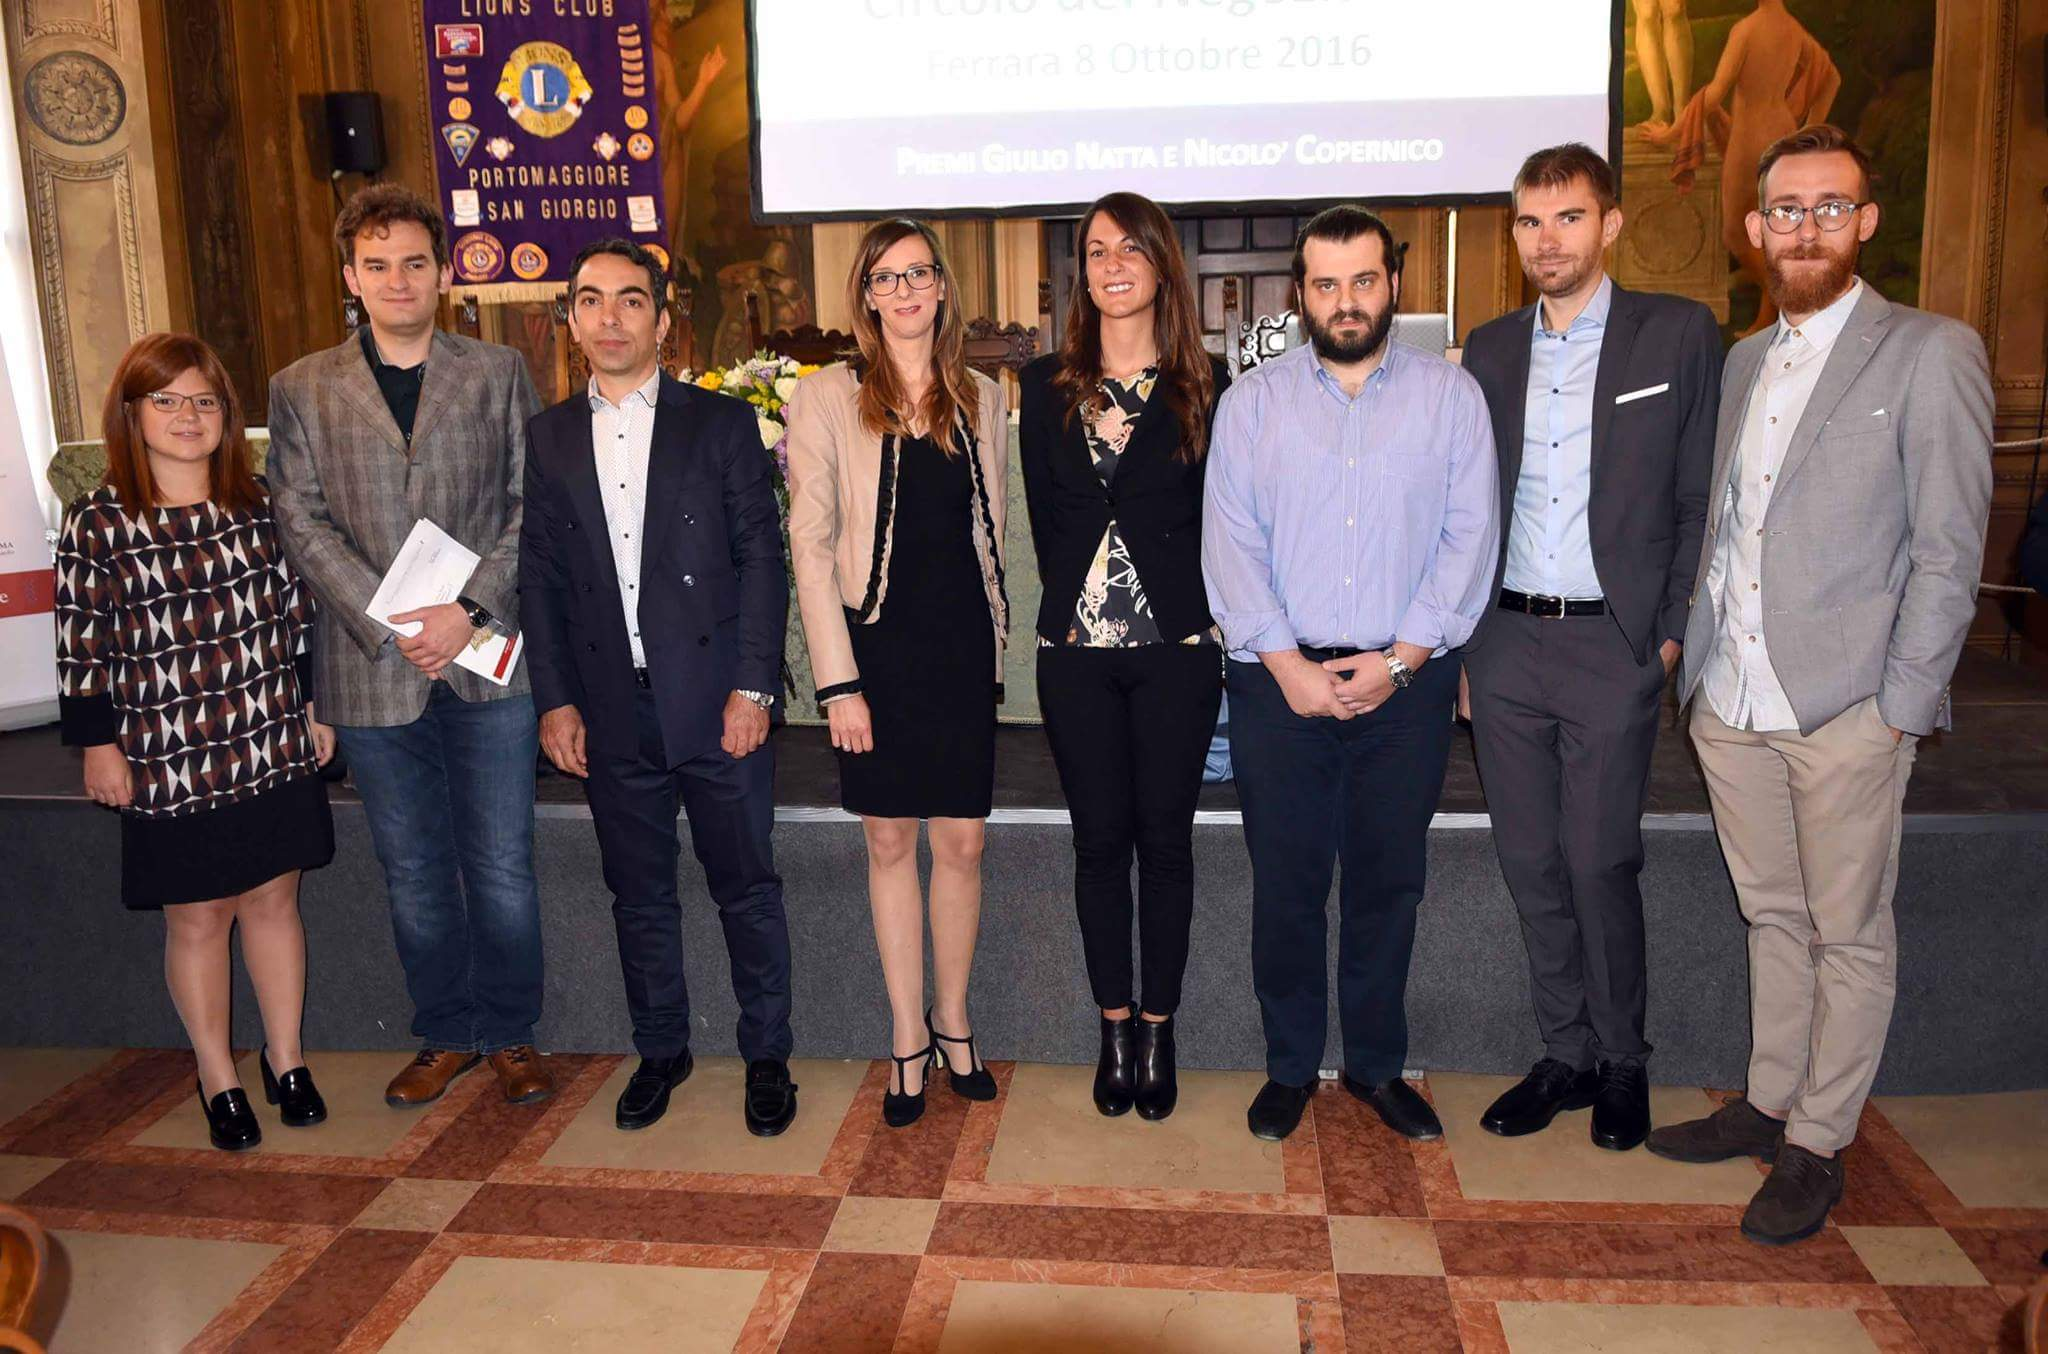 Giulio Natta and Nicolò Copernico Awards 2016